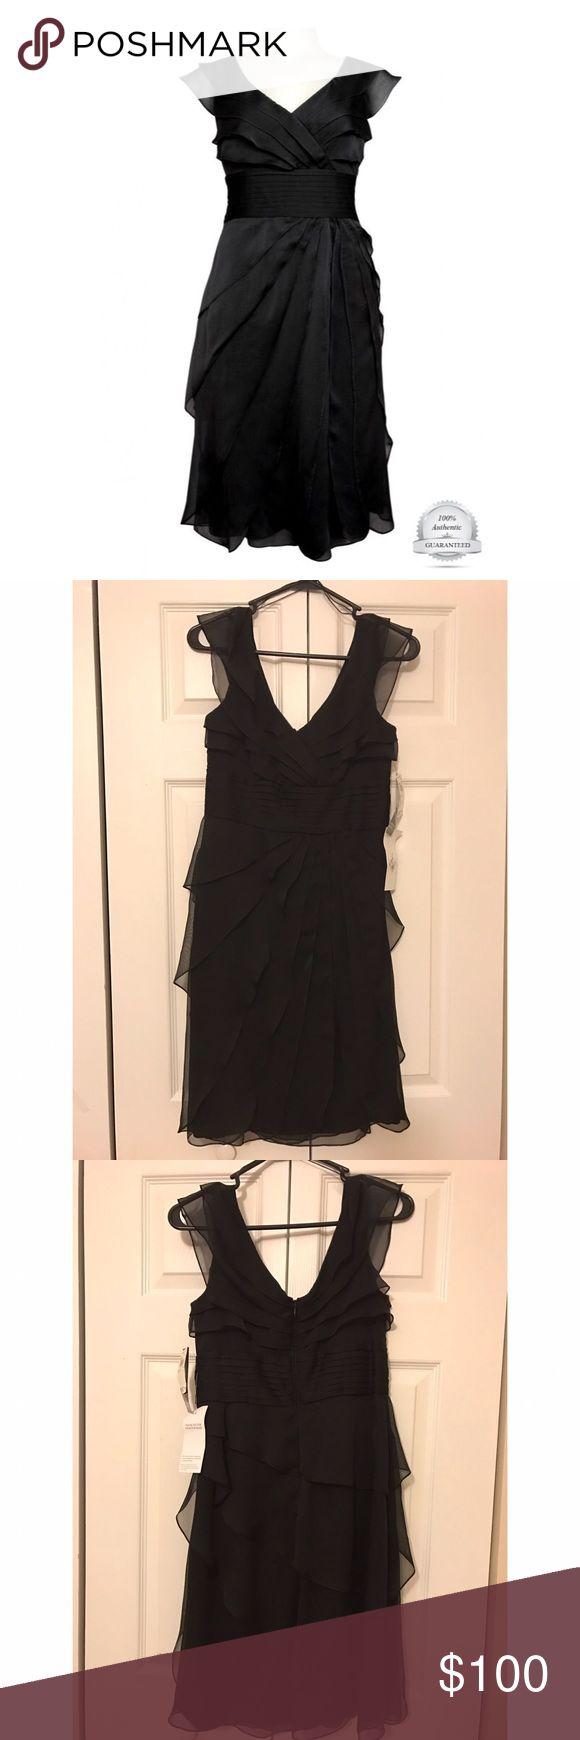 The Little Black Dress, Size 2 (Petite) Adrianna Papell Cascading Tier Chiffon Dress (Petite), Size 2 Adrianna Papell Dresses